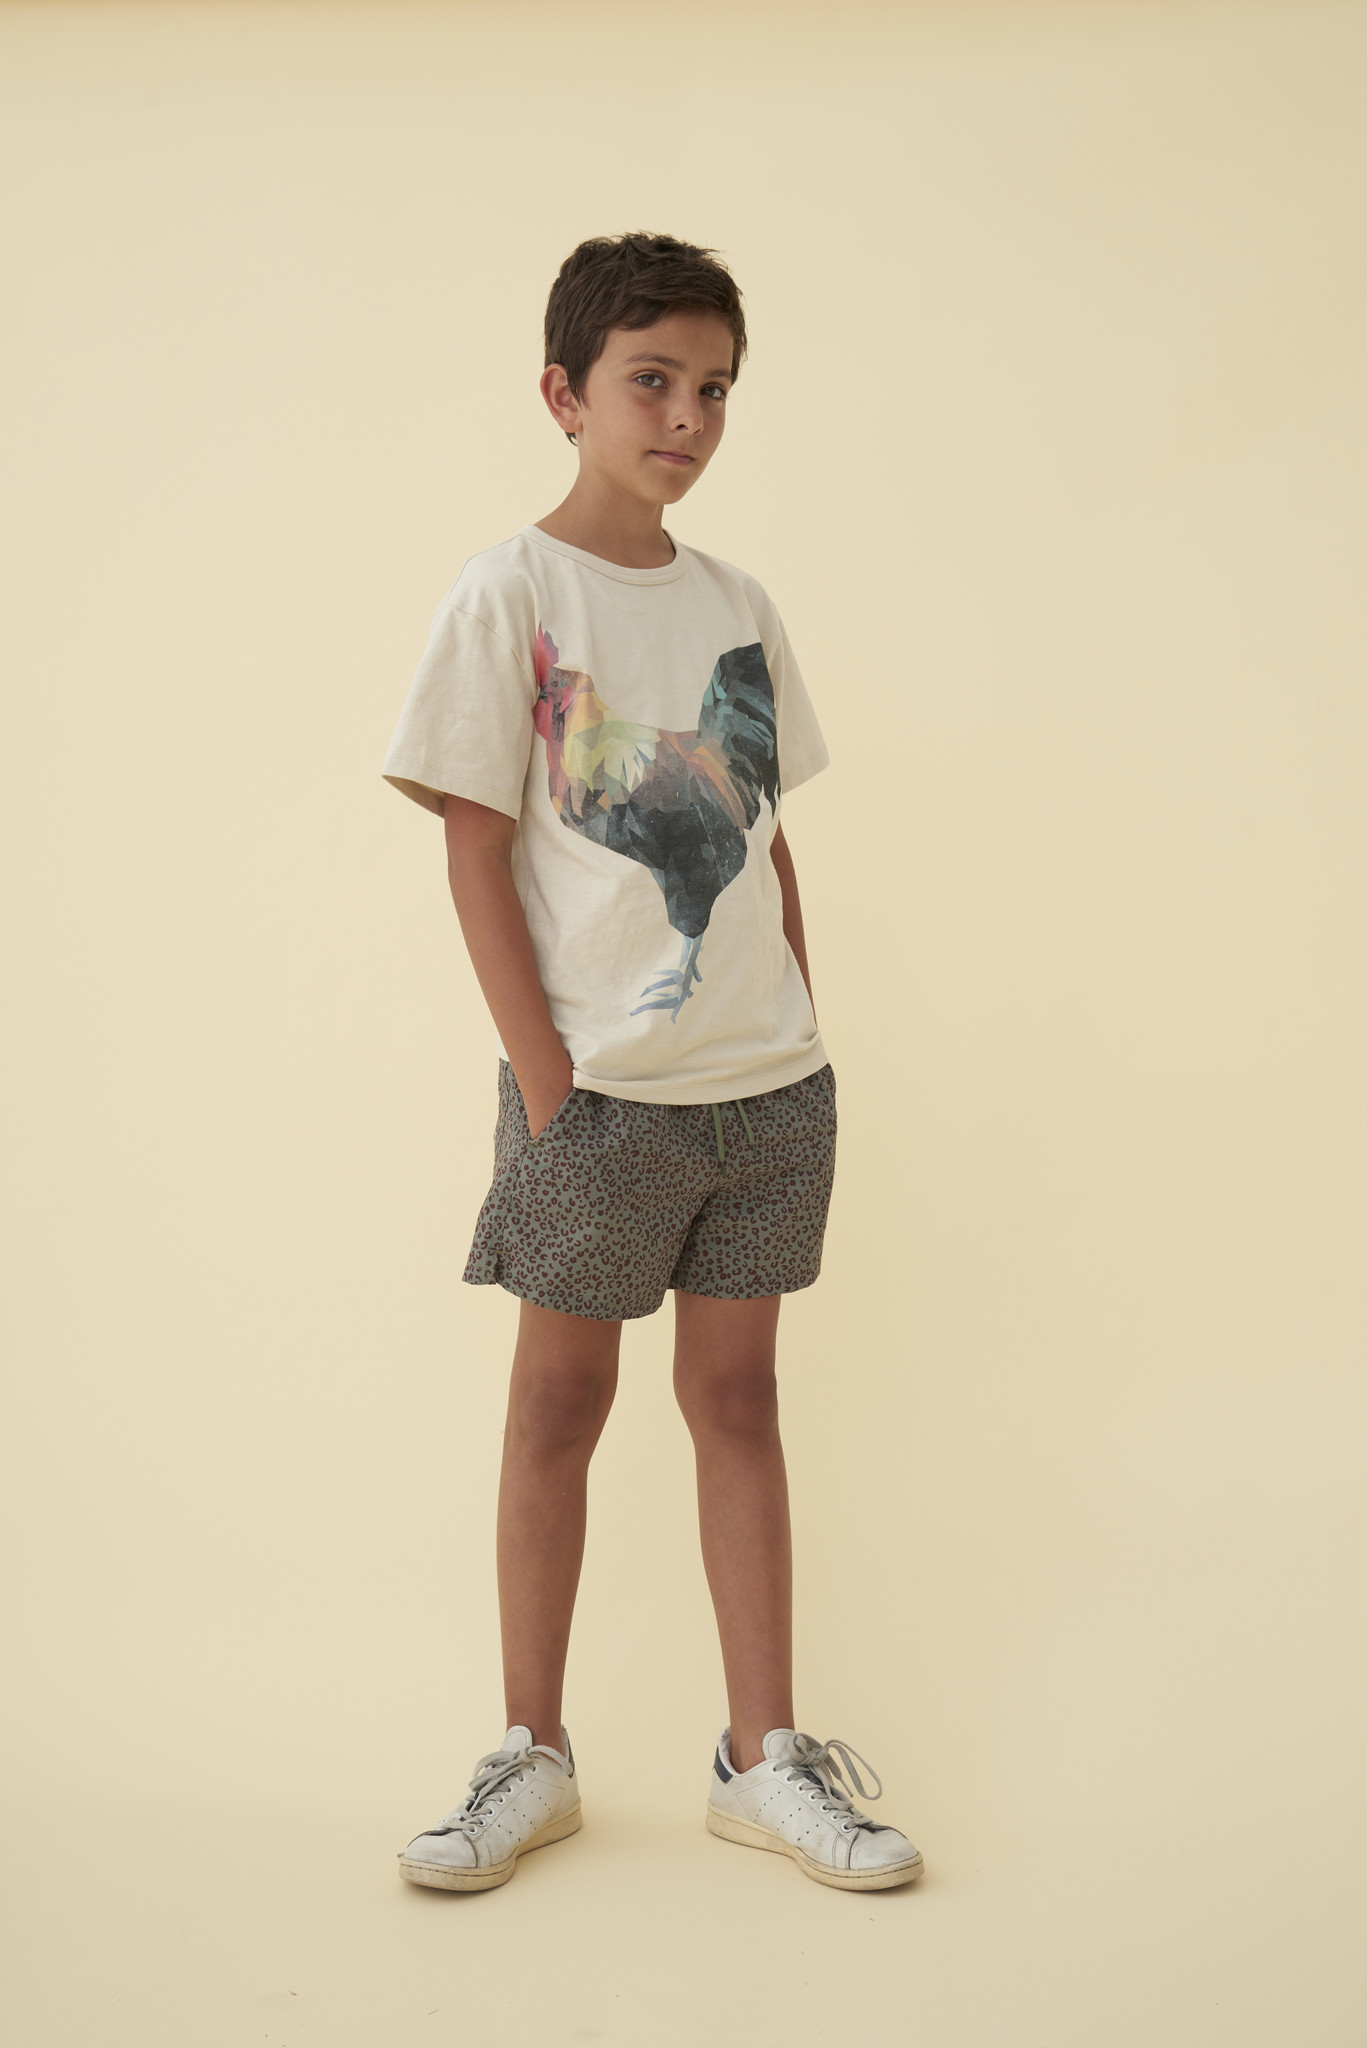 Asger T-shirt - Oyster Gray / Hancock-2